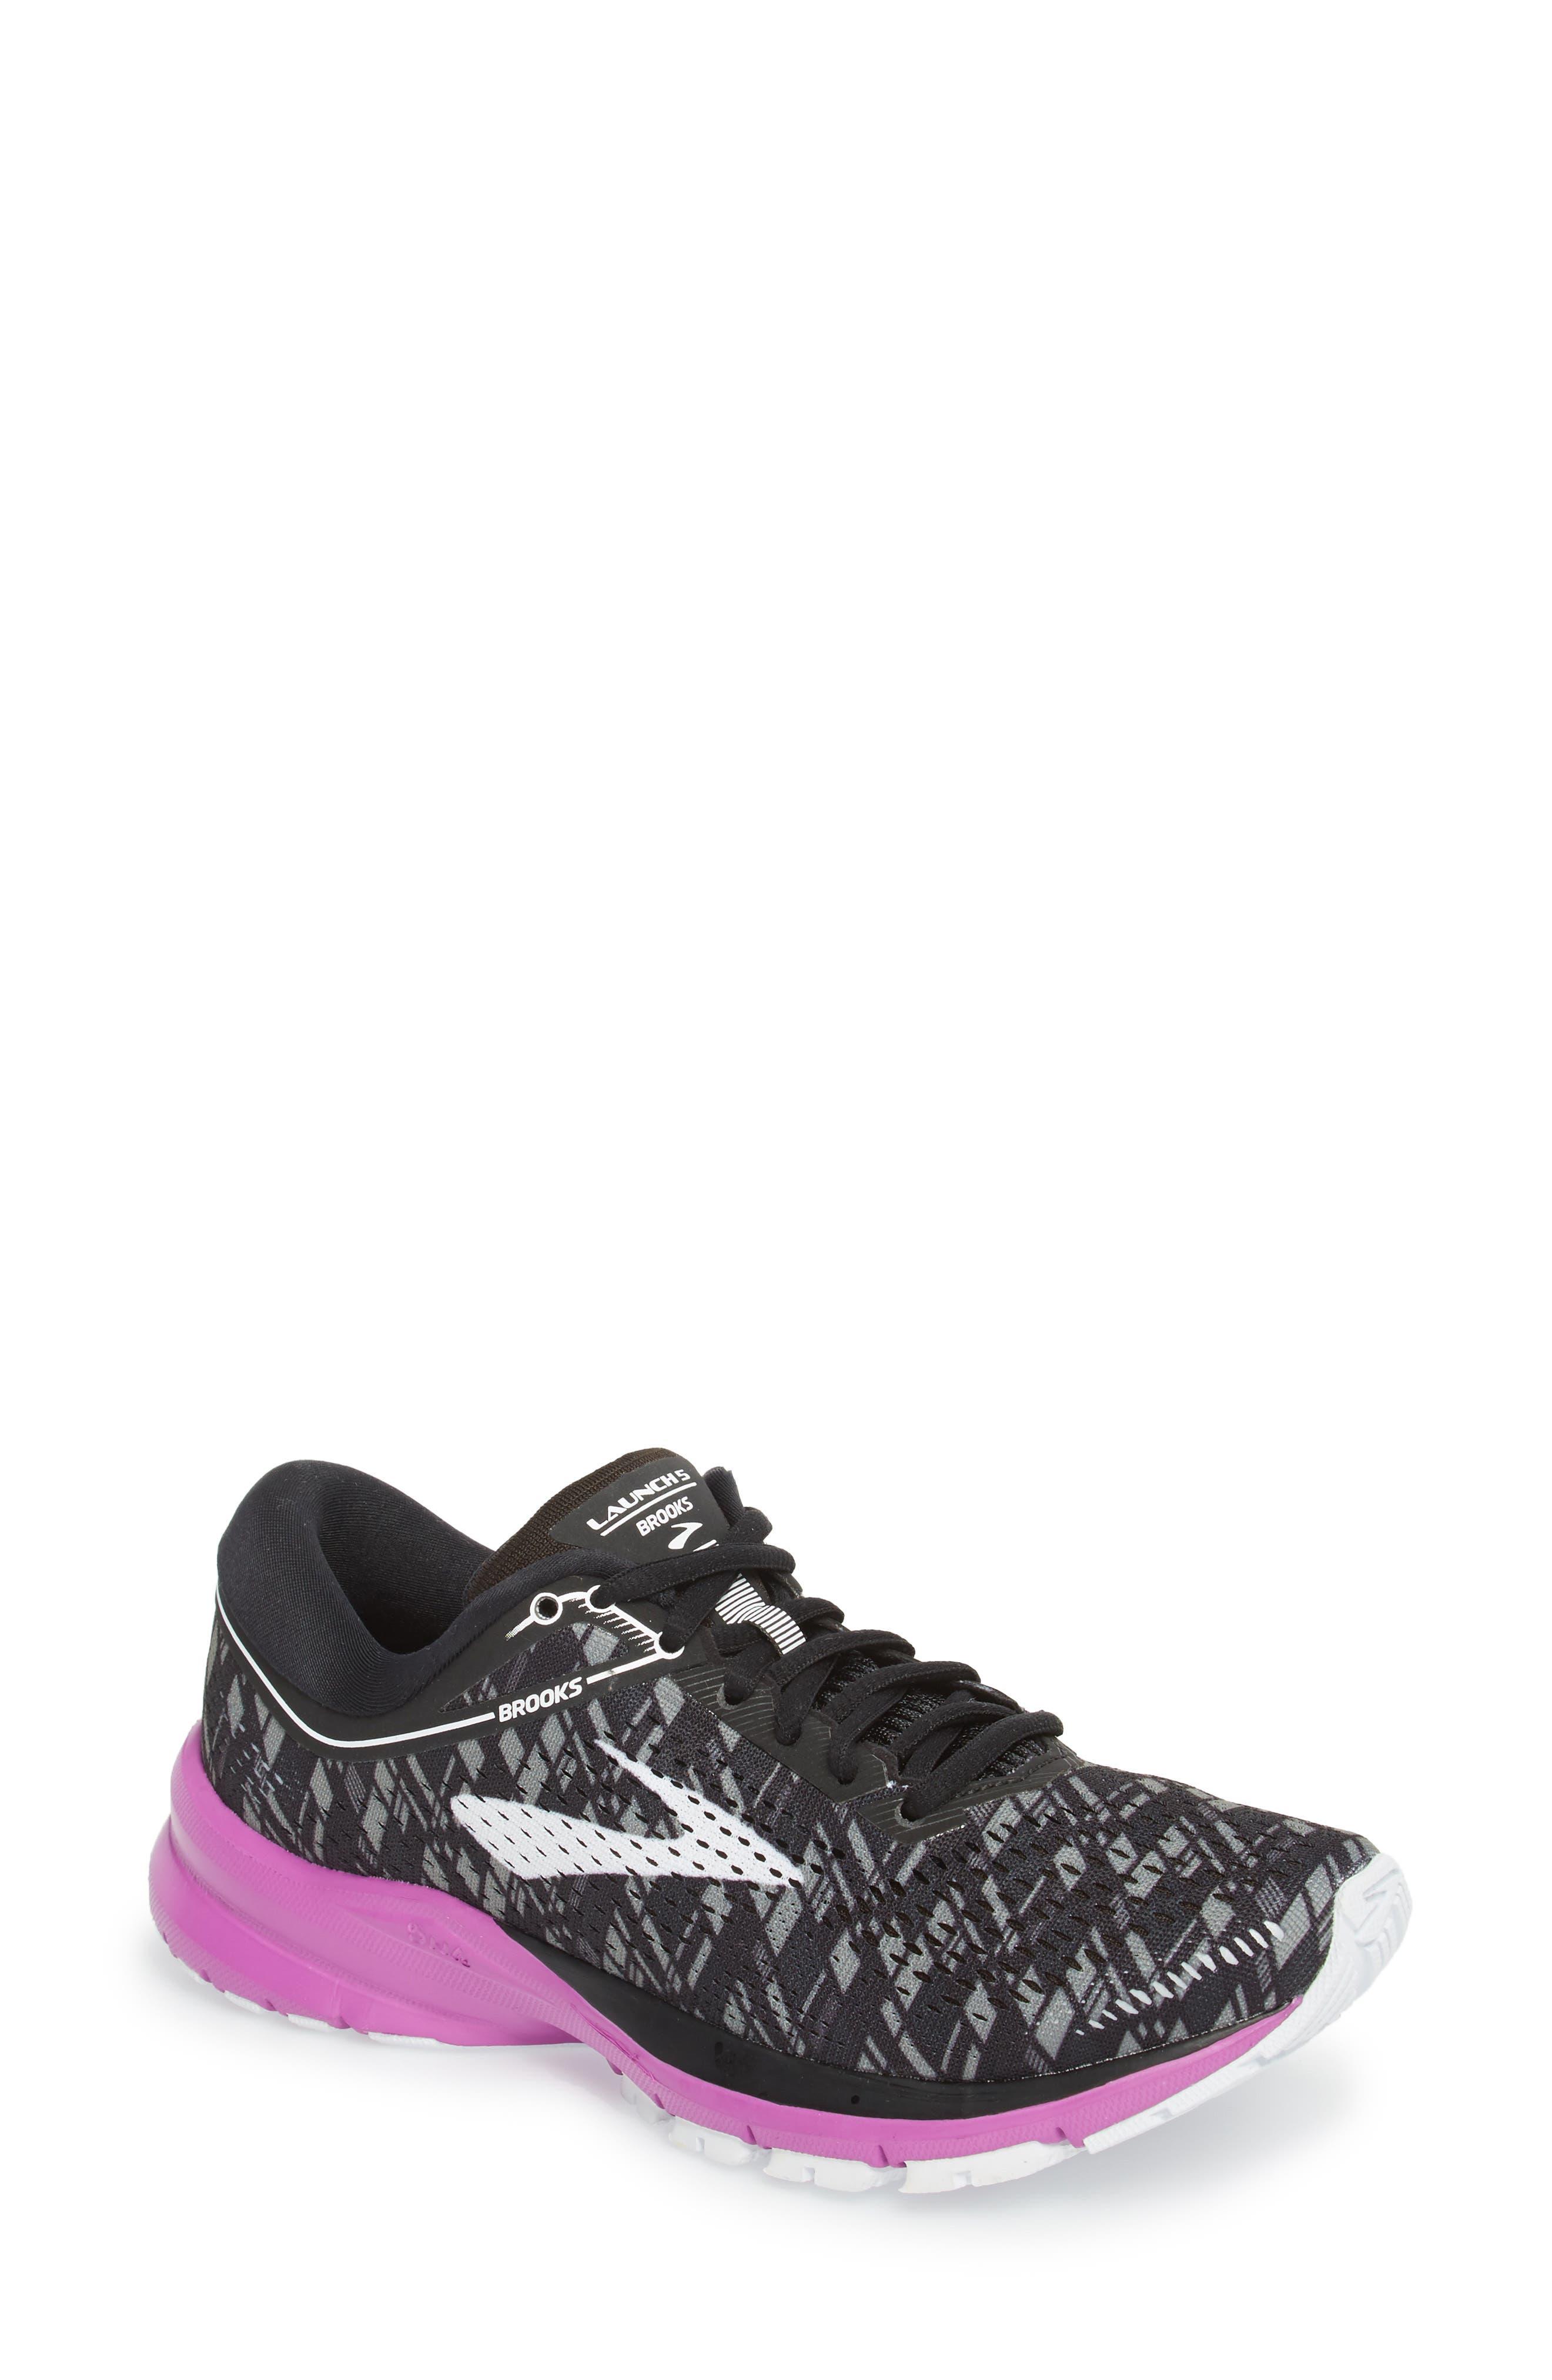 Launch 5 Running Shoe,                         Main,                         color, BLACK/ PURPLE/ PRINT